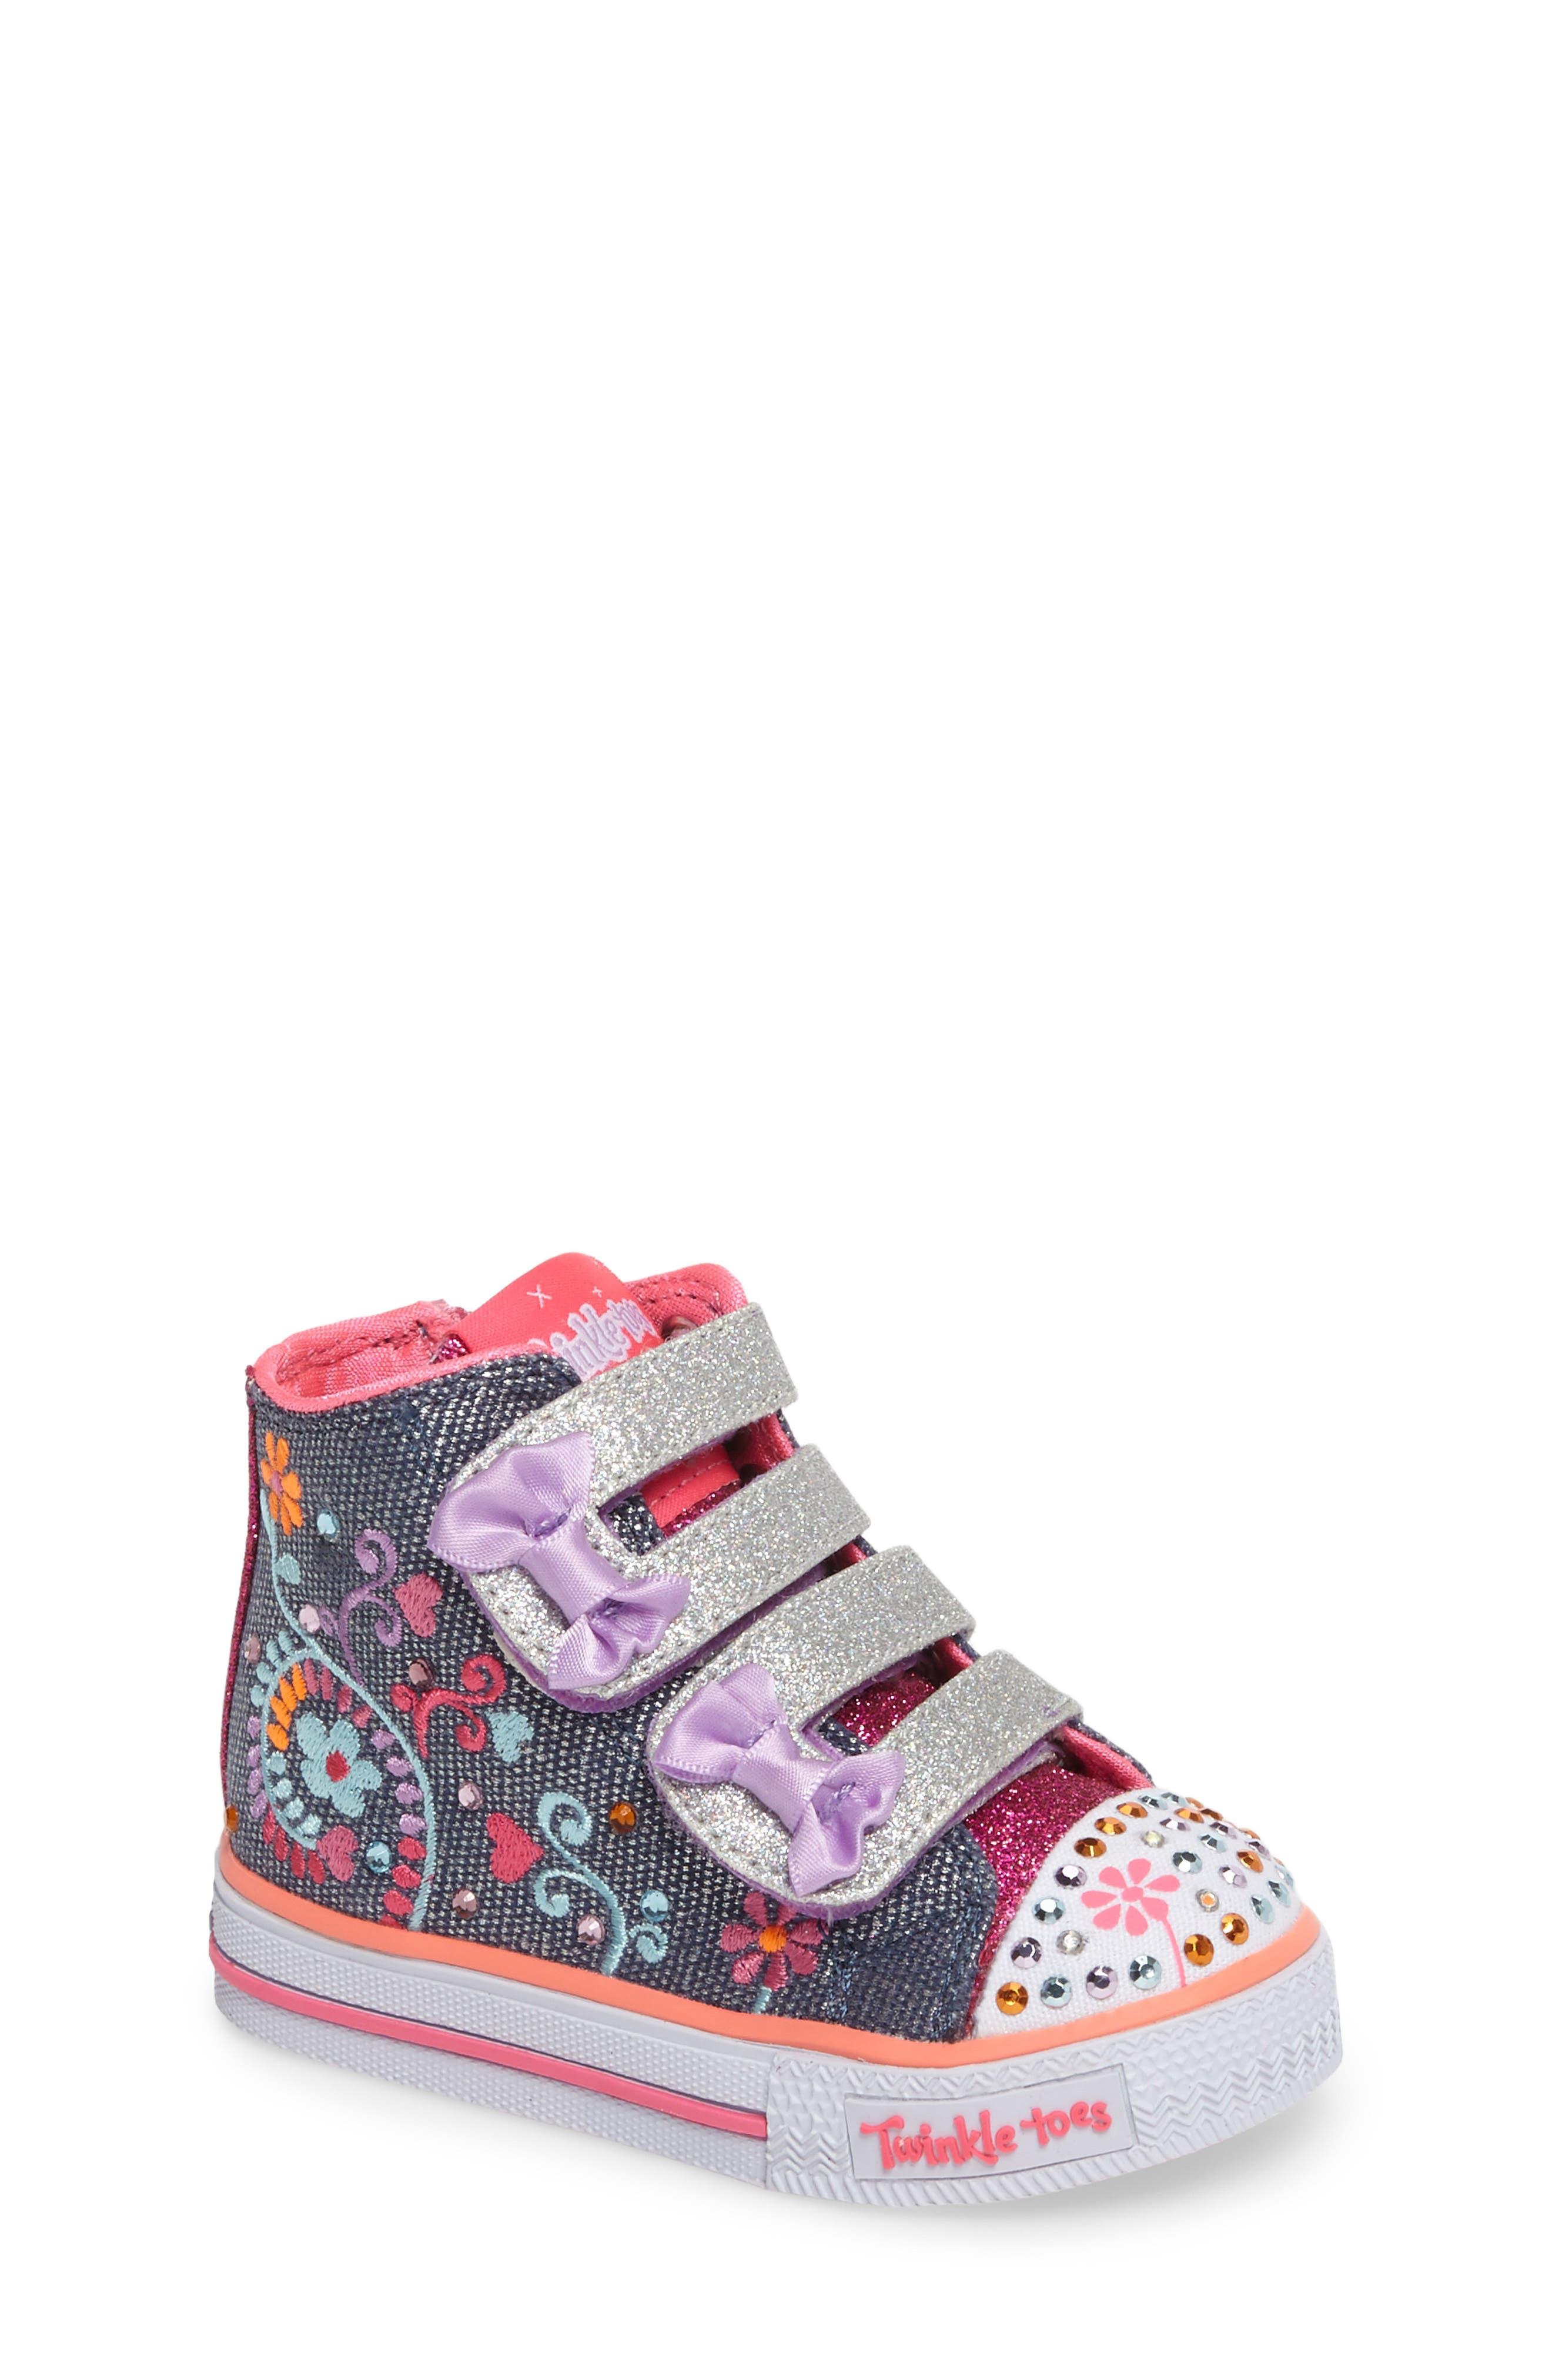 Main Image - SKECHERS Shuffles Sneaker (Walker & Toddler)